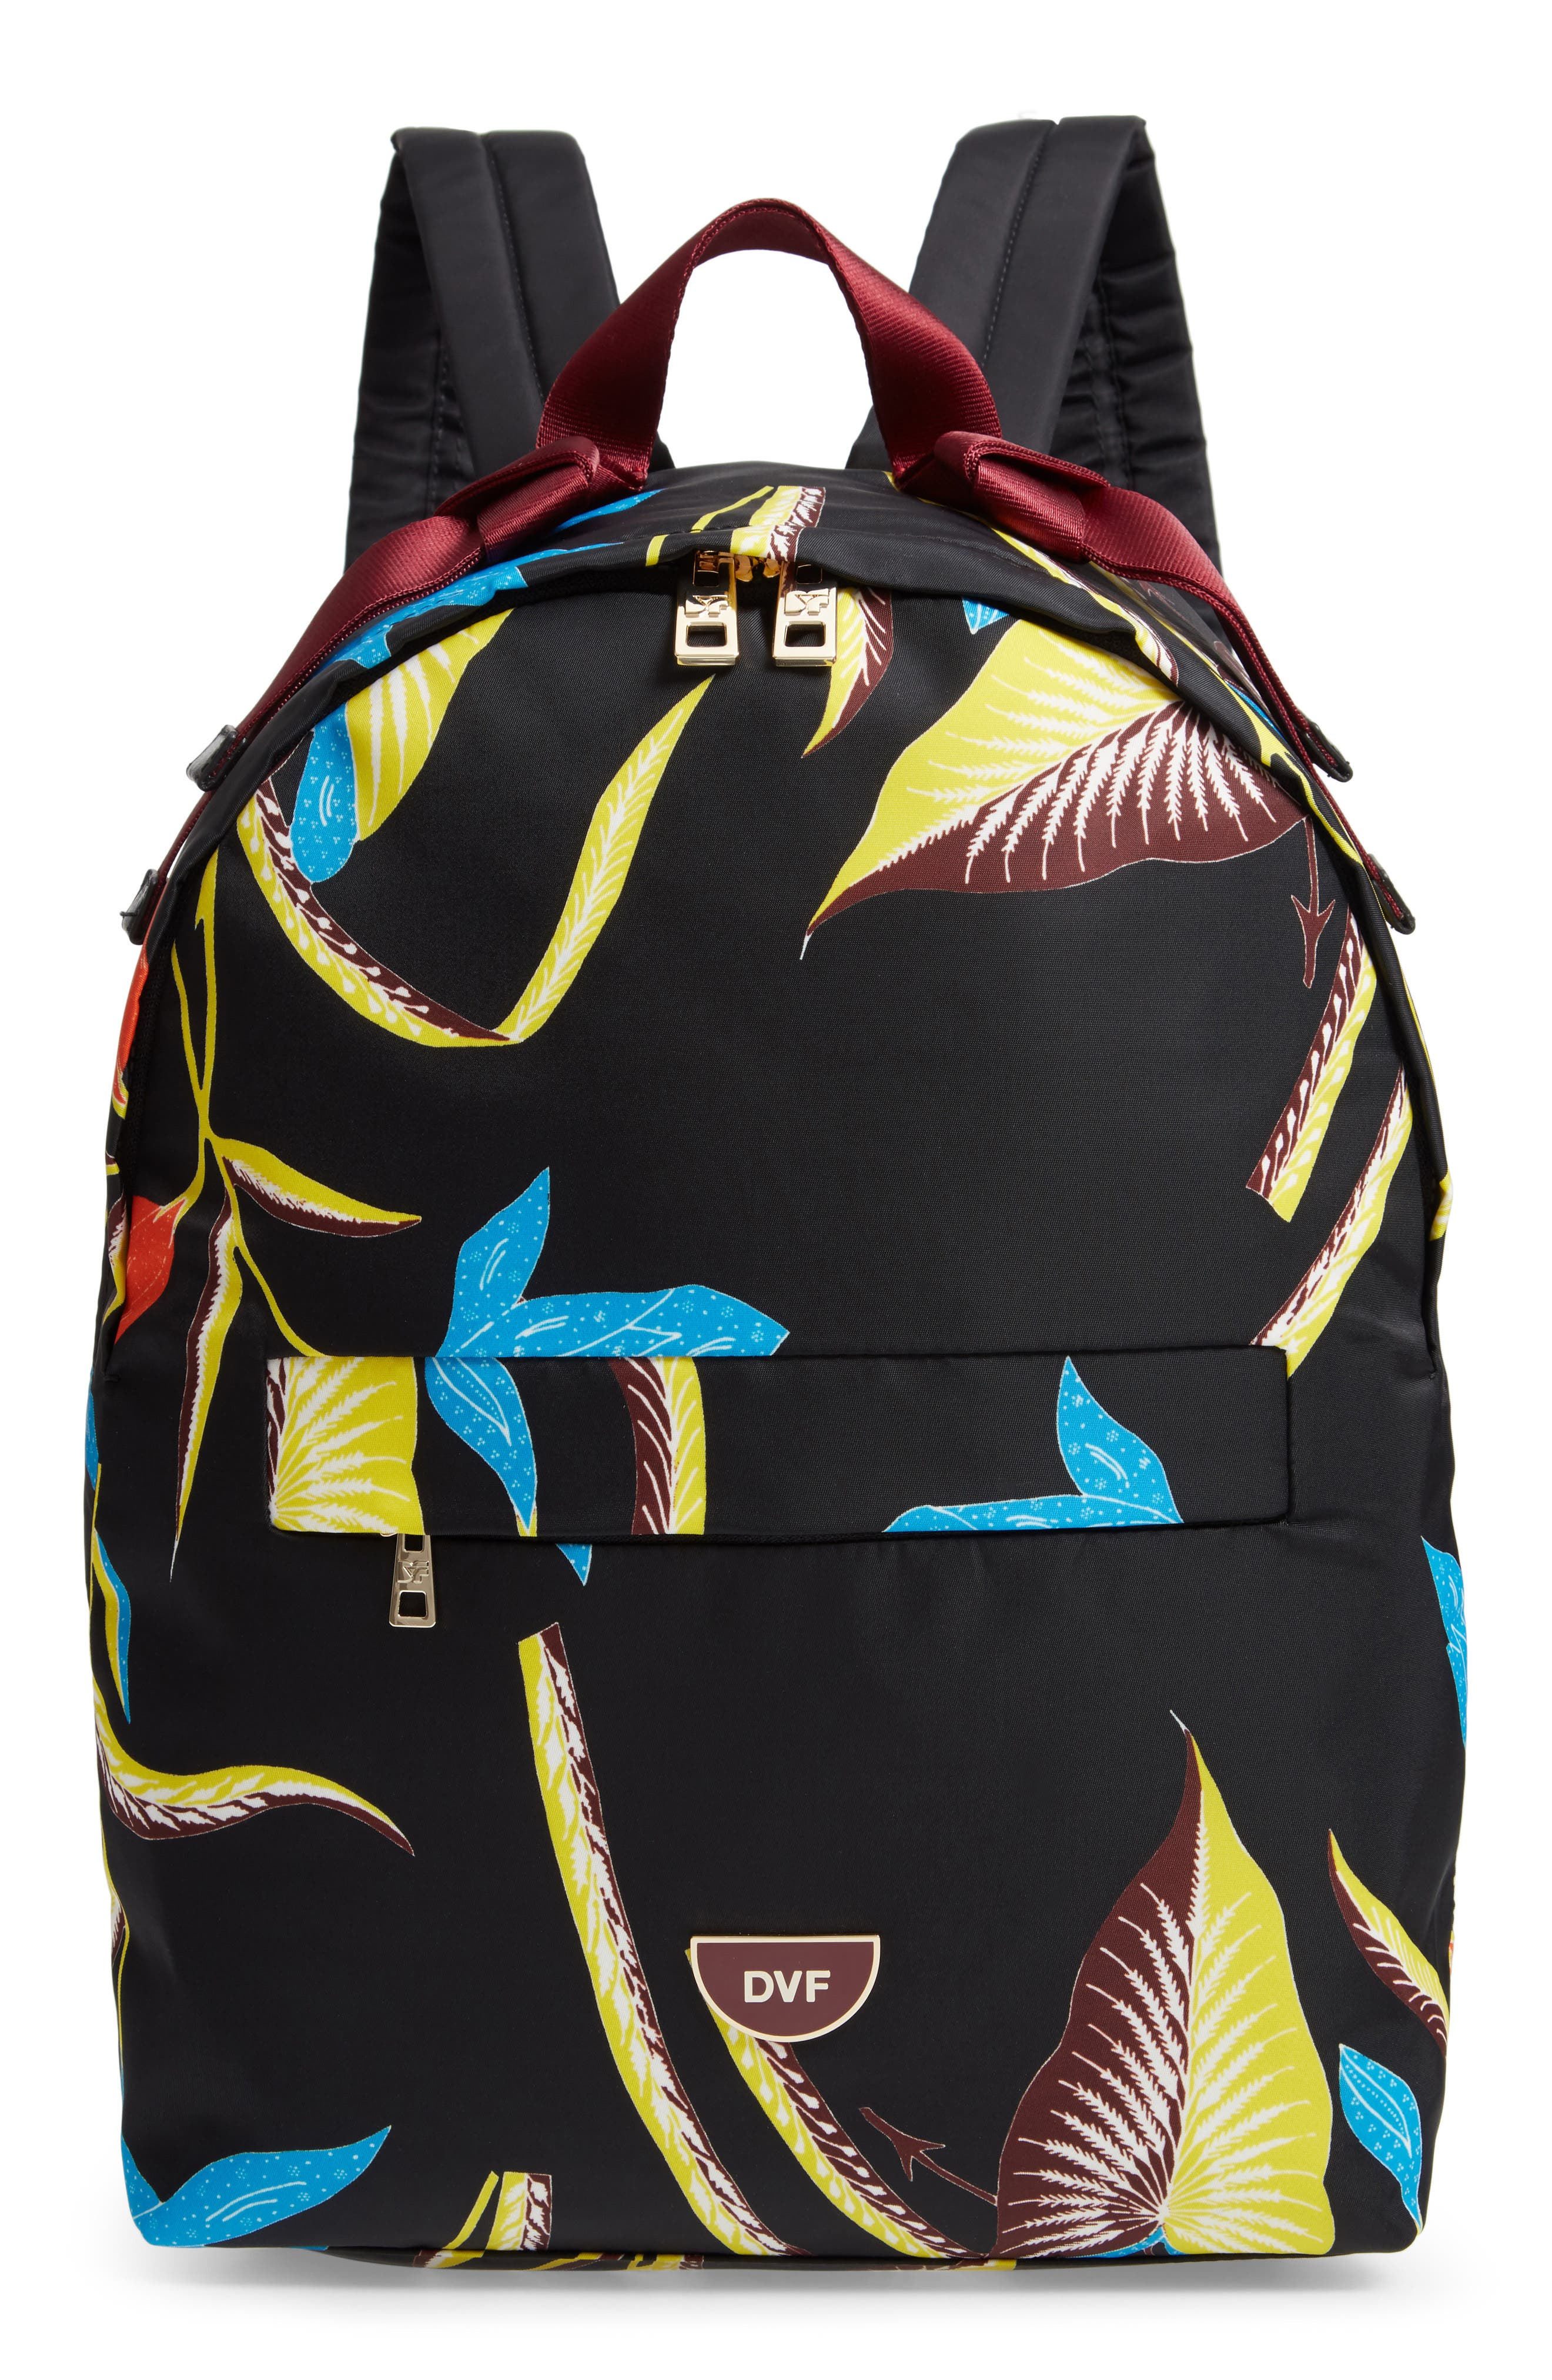 DVF Print Nylon Backpack,                             Main thumbnail 1, color,                             002